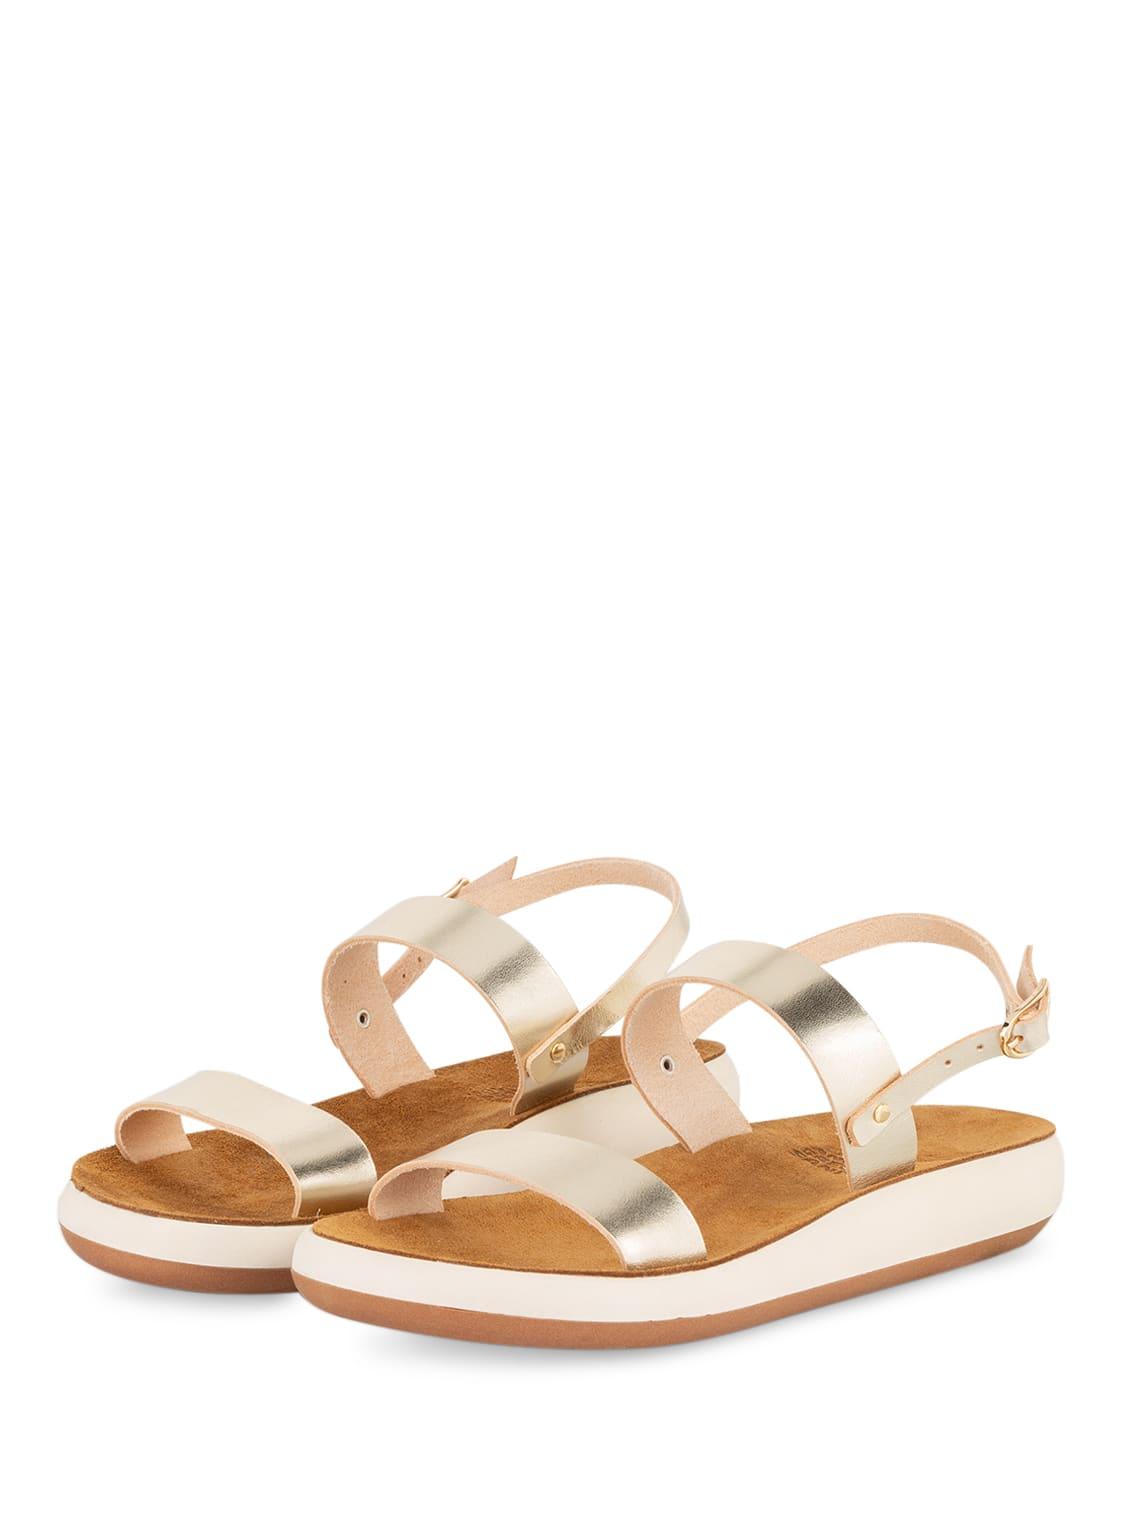 Image of Ancient Greek Sandals Sandalen Clio Comfort gold